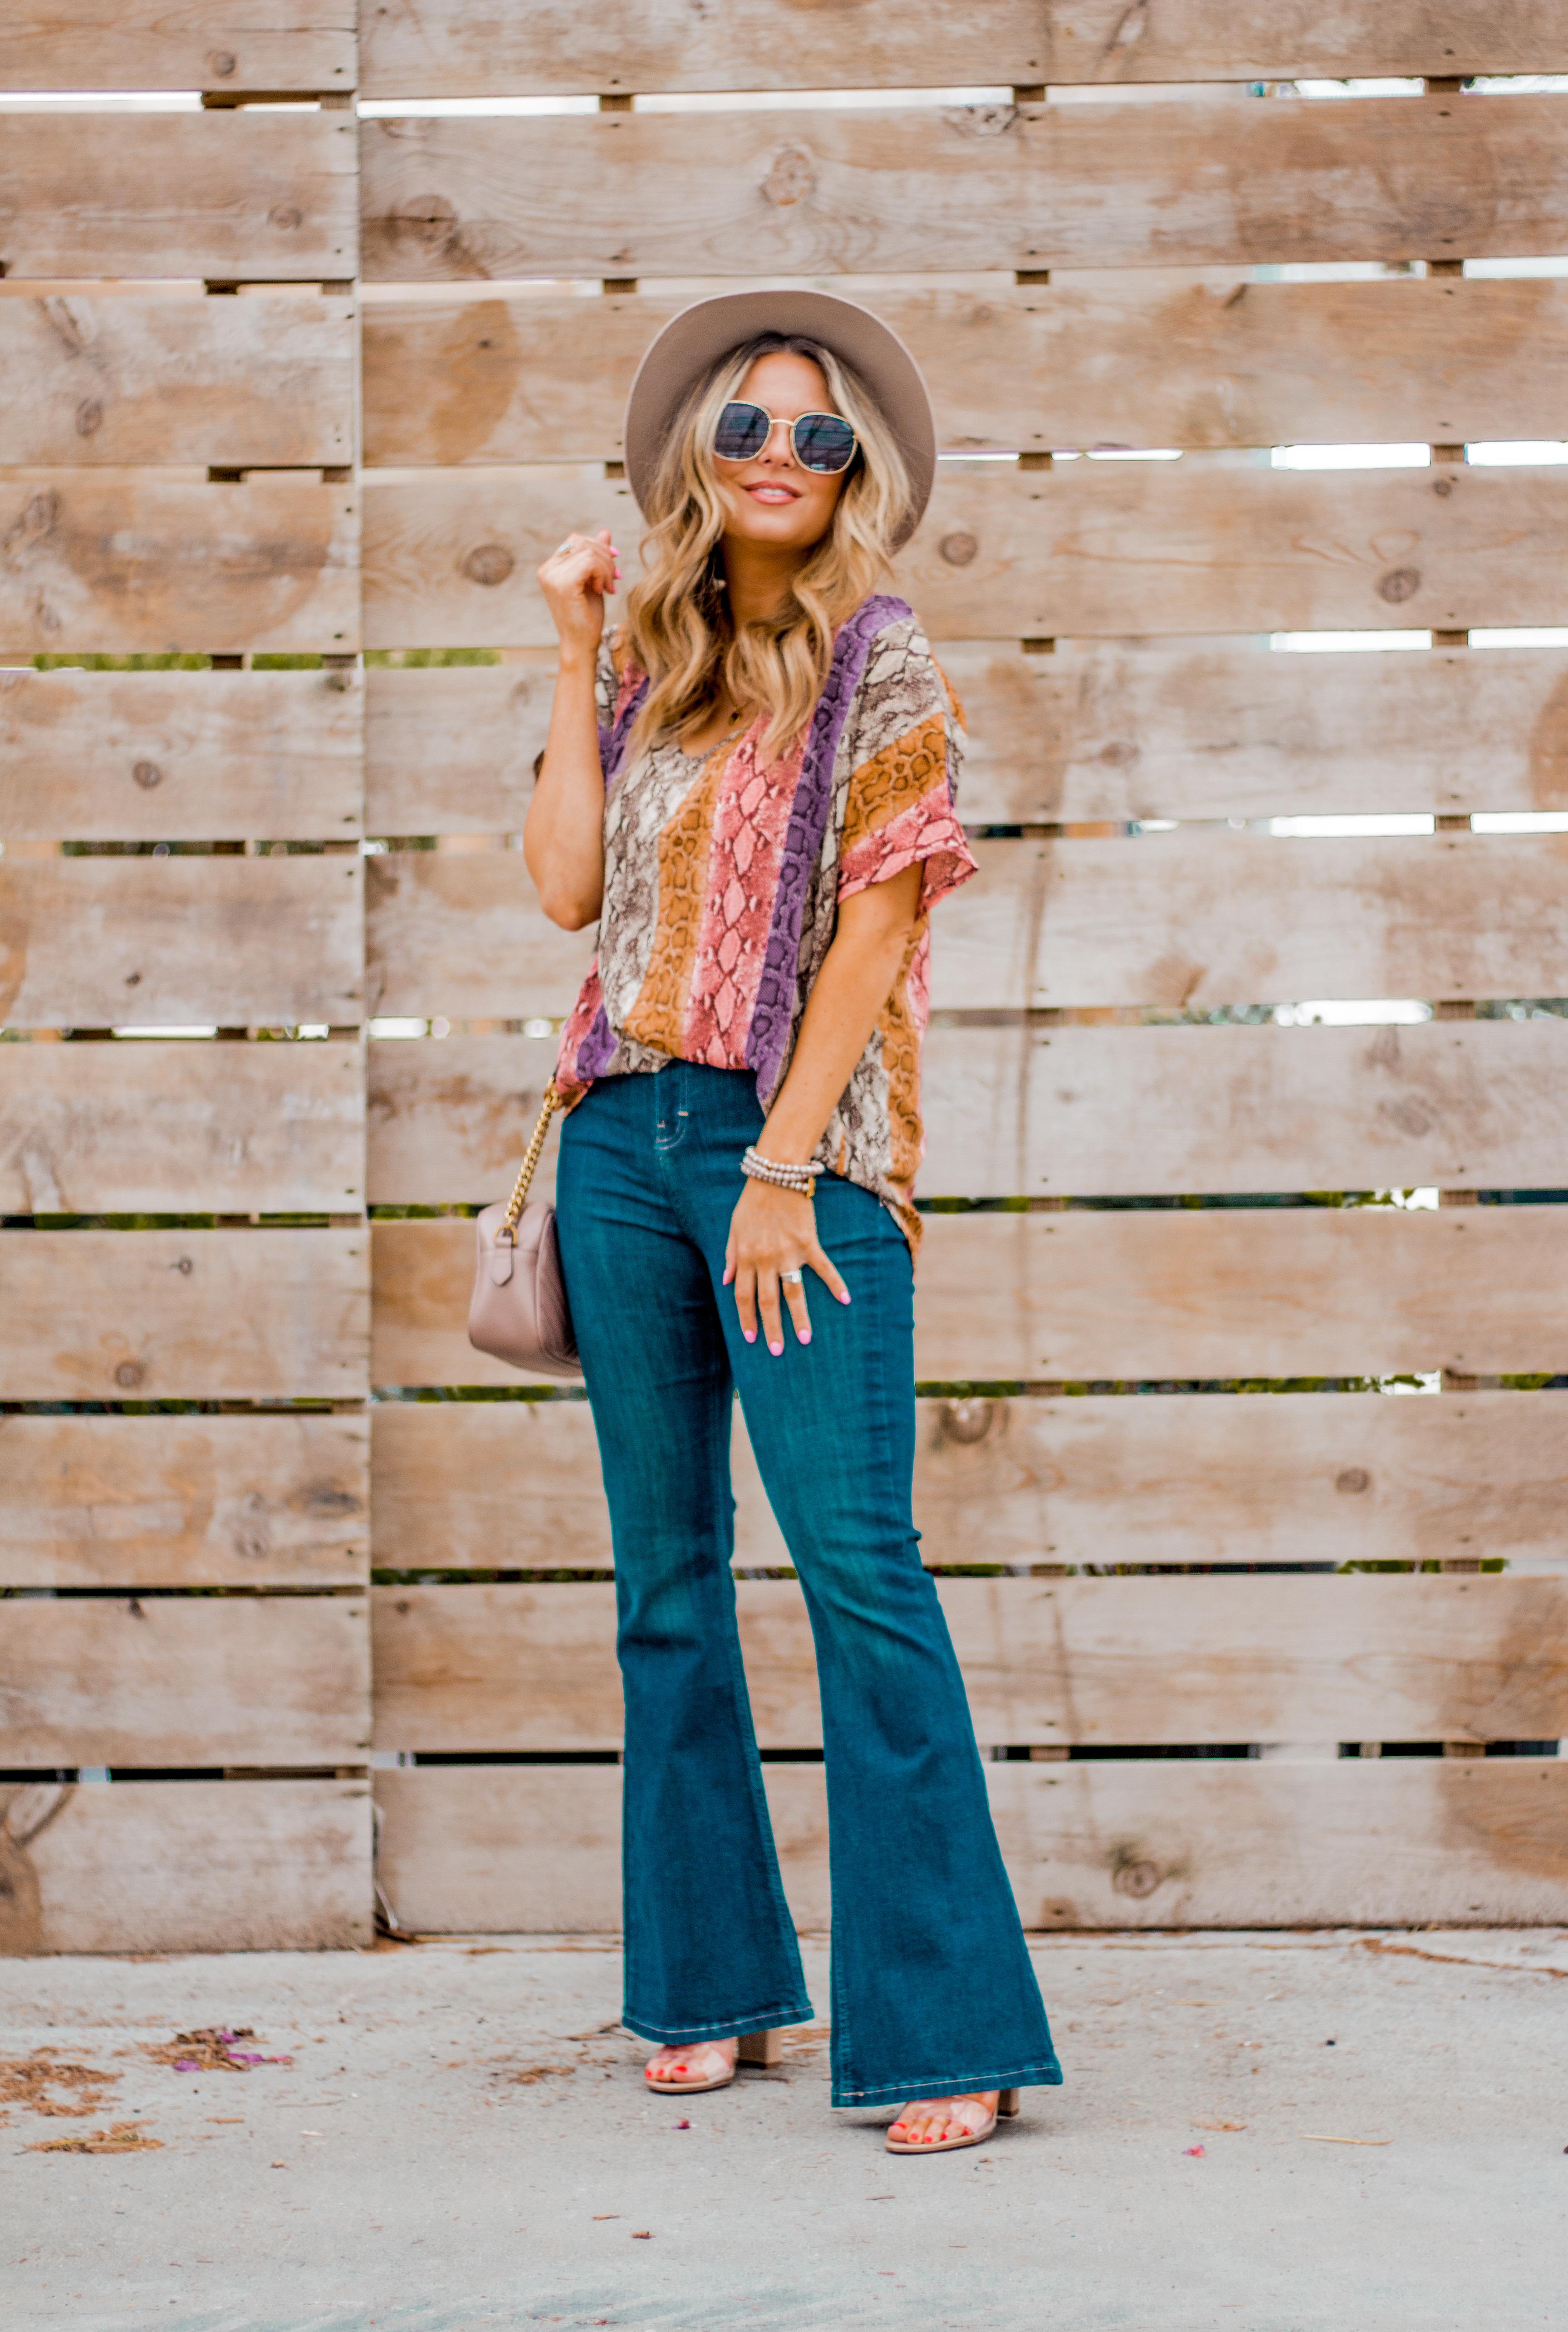 Women's Fashion - Snakeskin Print - Snakeskin Trend - Spring Fashion Trend - Omaha Fashion Blog - Boho Vibes - Flare Jeans - 17